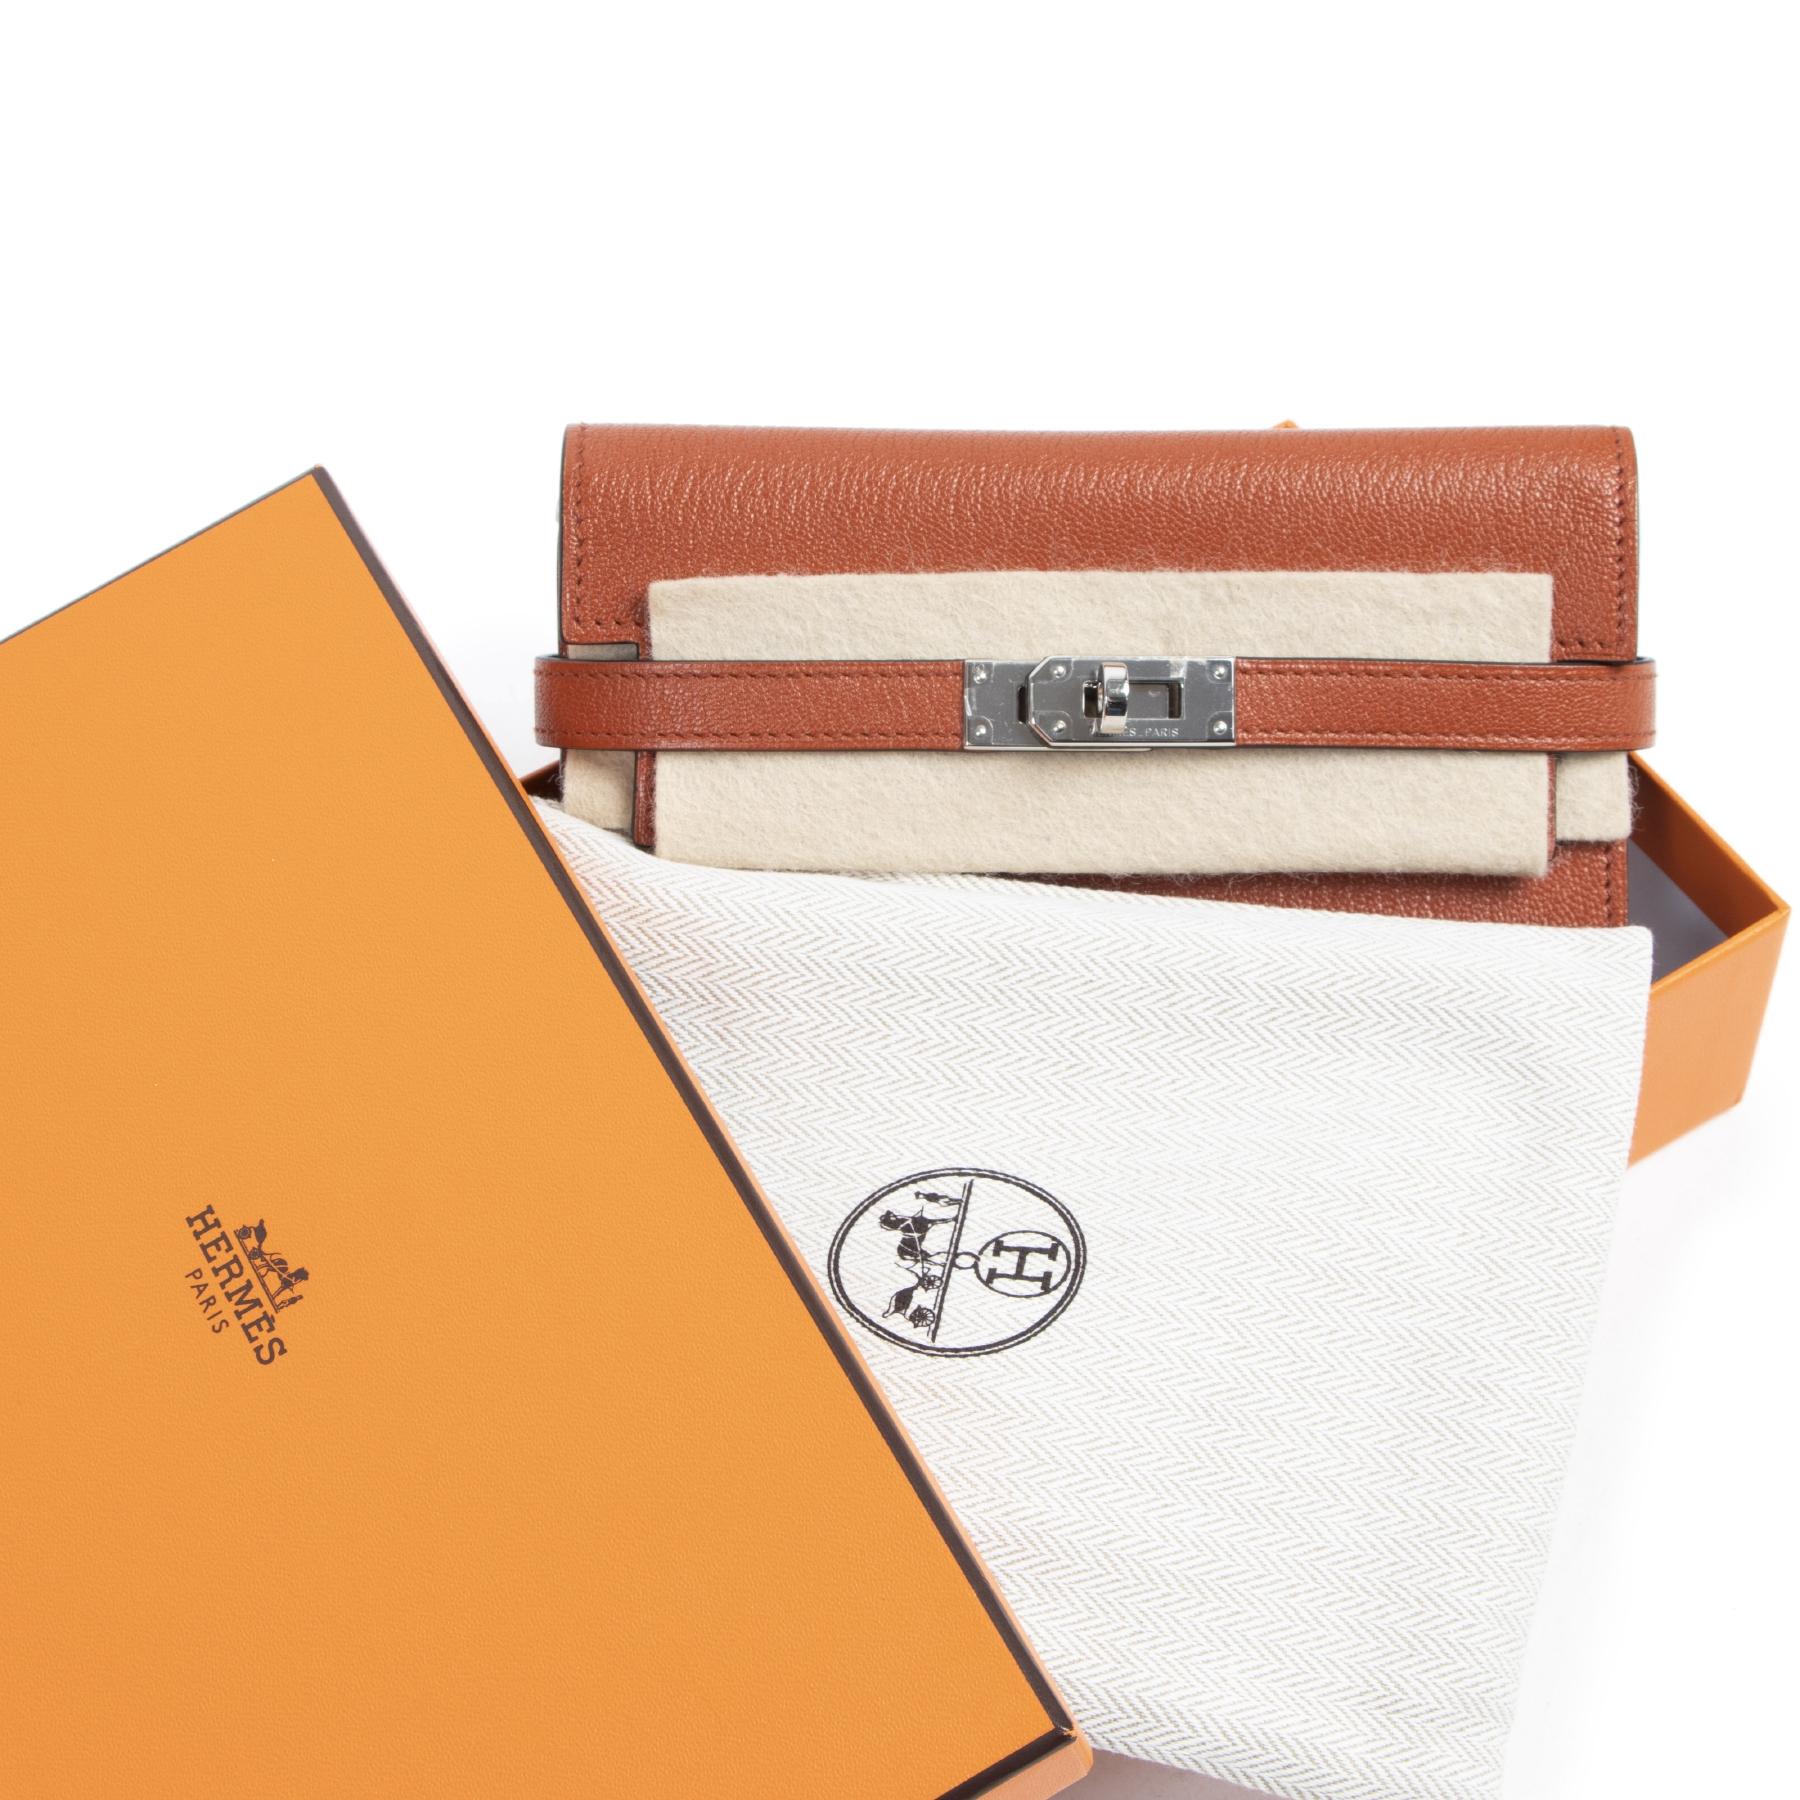 Authentieke tweedehands vintage Hermès Kelly Wallet Chèvre Mysore Brique PHW koop online webshop LabelLOV